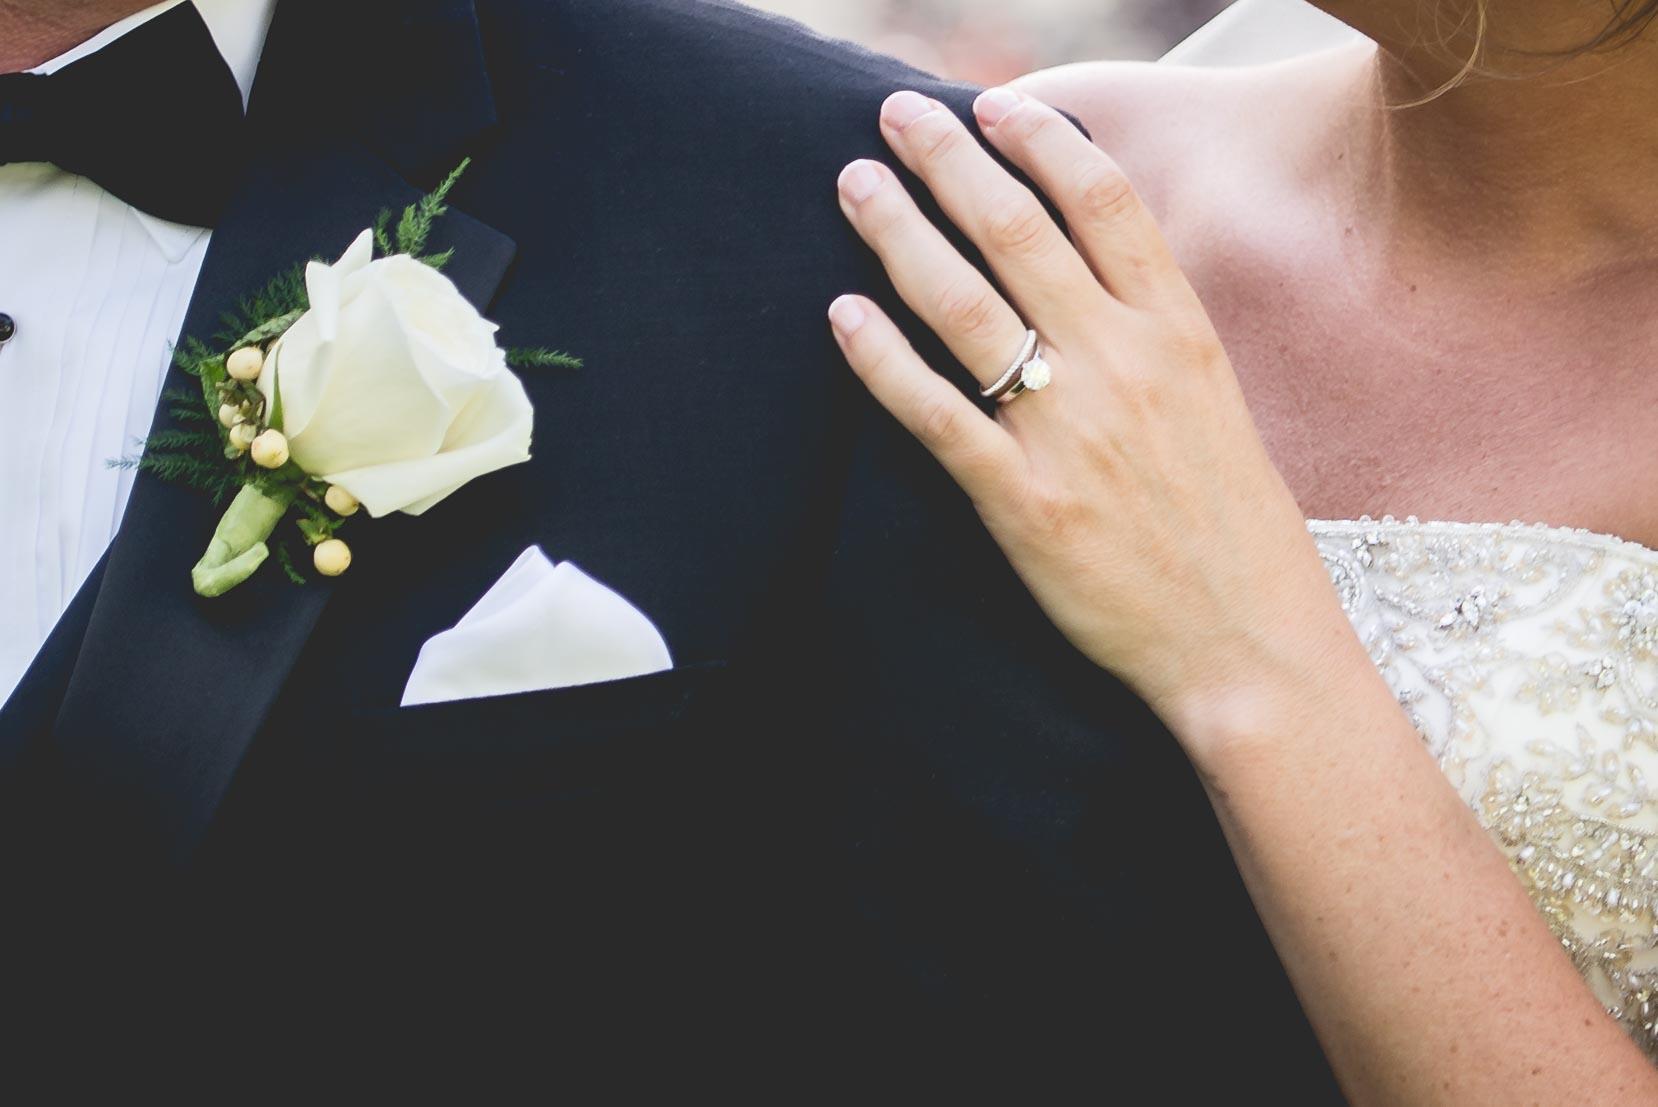 sarasutterphotography_leeandshalon_wedding_2015-569.jpg